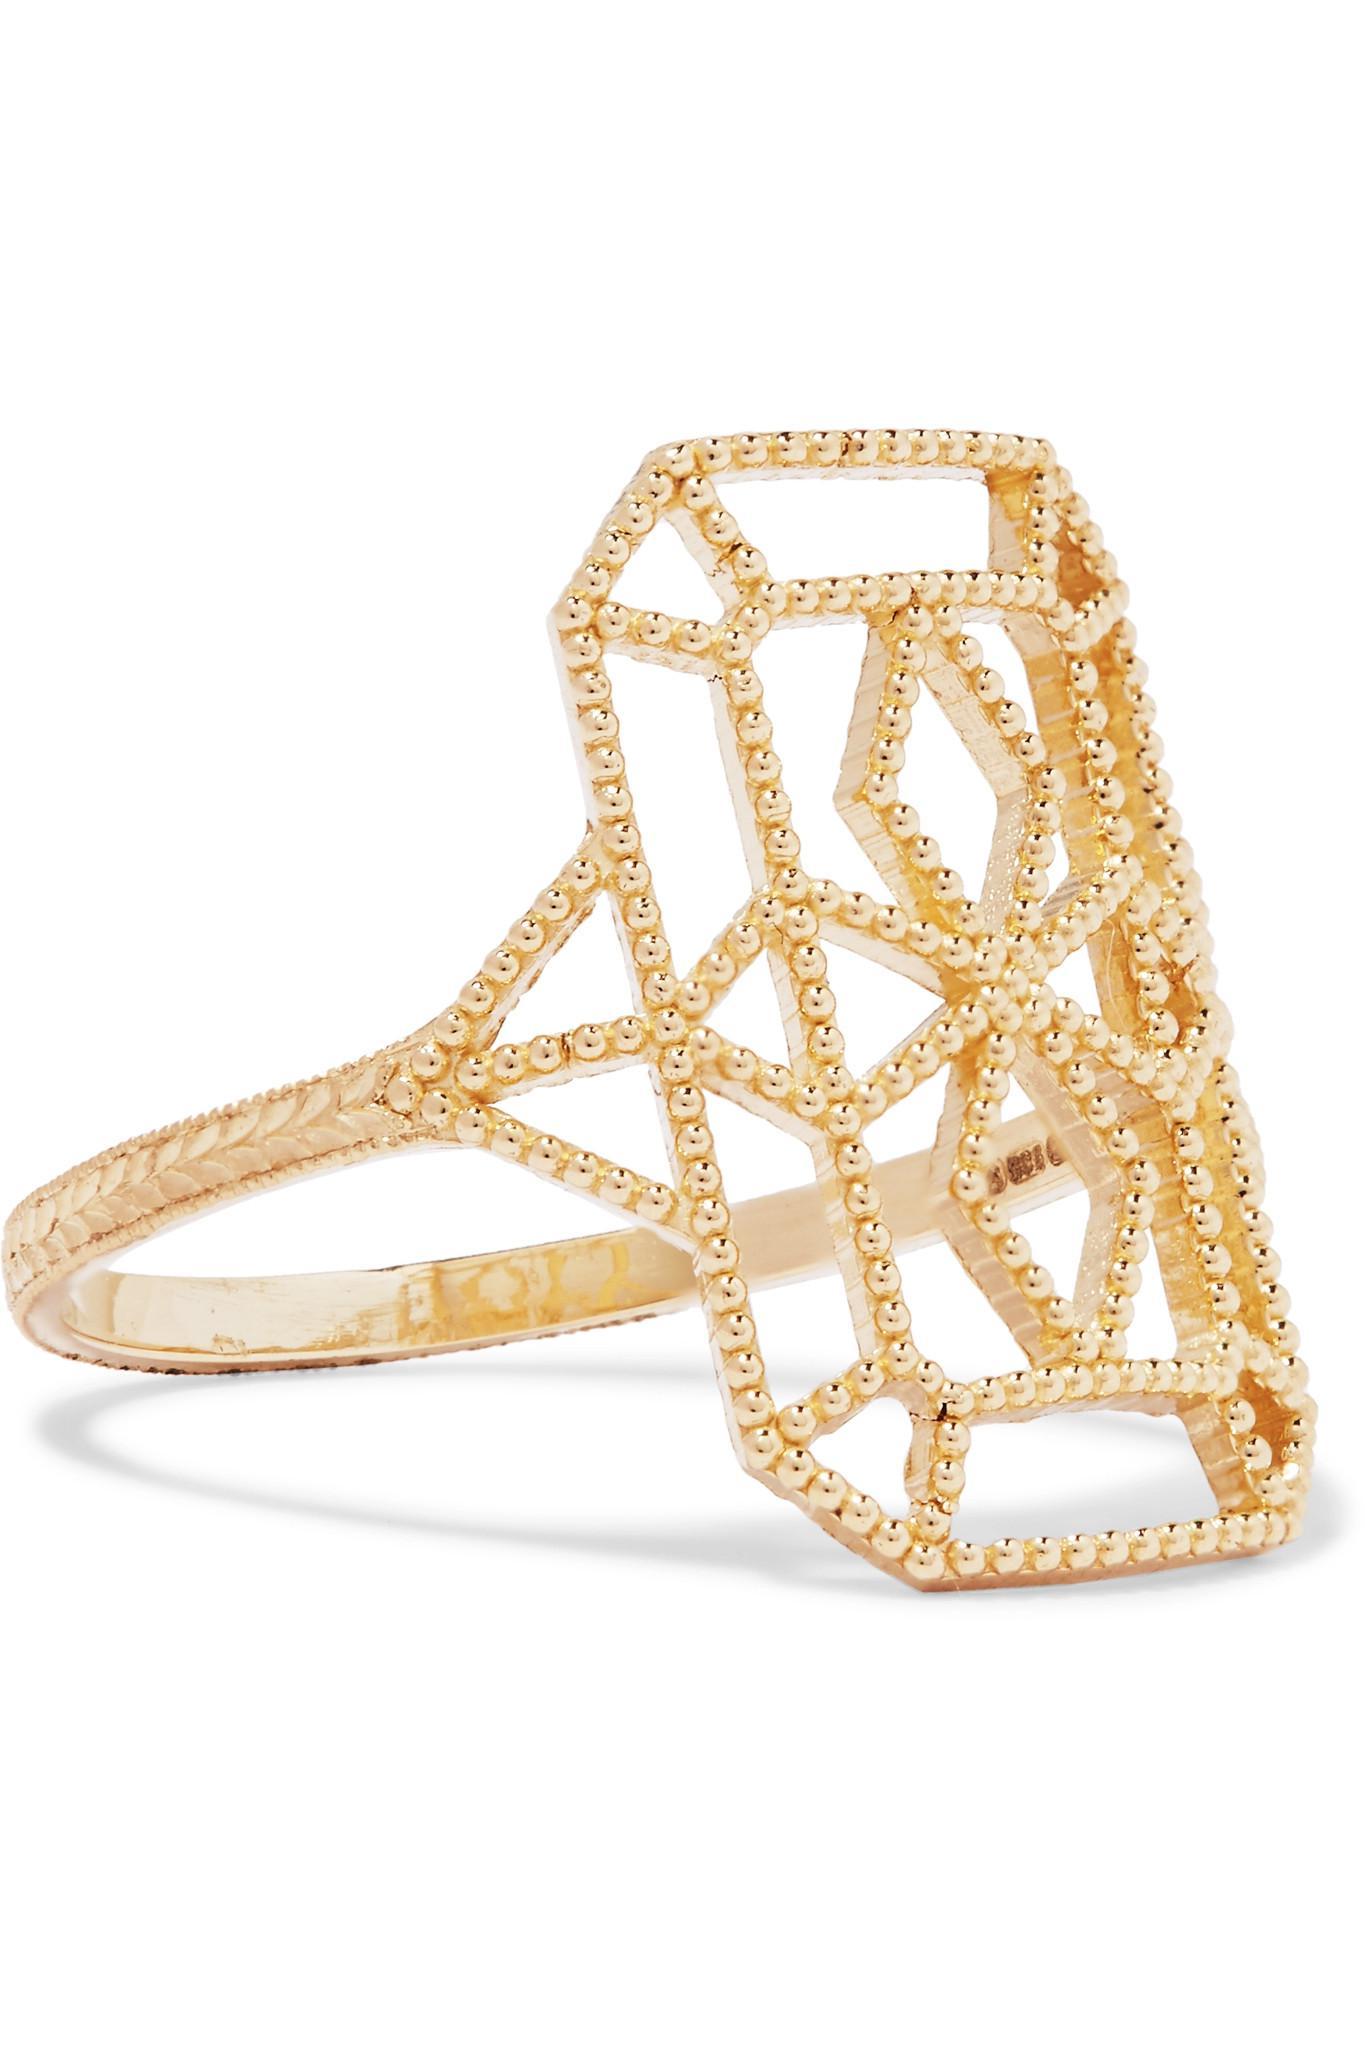 Grace Lee Designs Lace Deco Vi 14-karat Gold Ring X0iKBxYR0